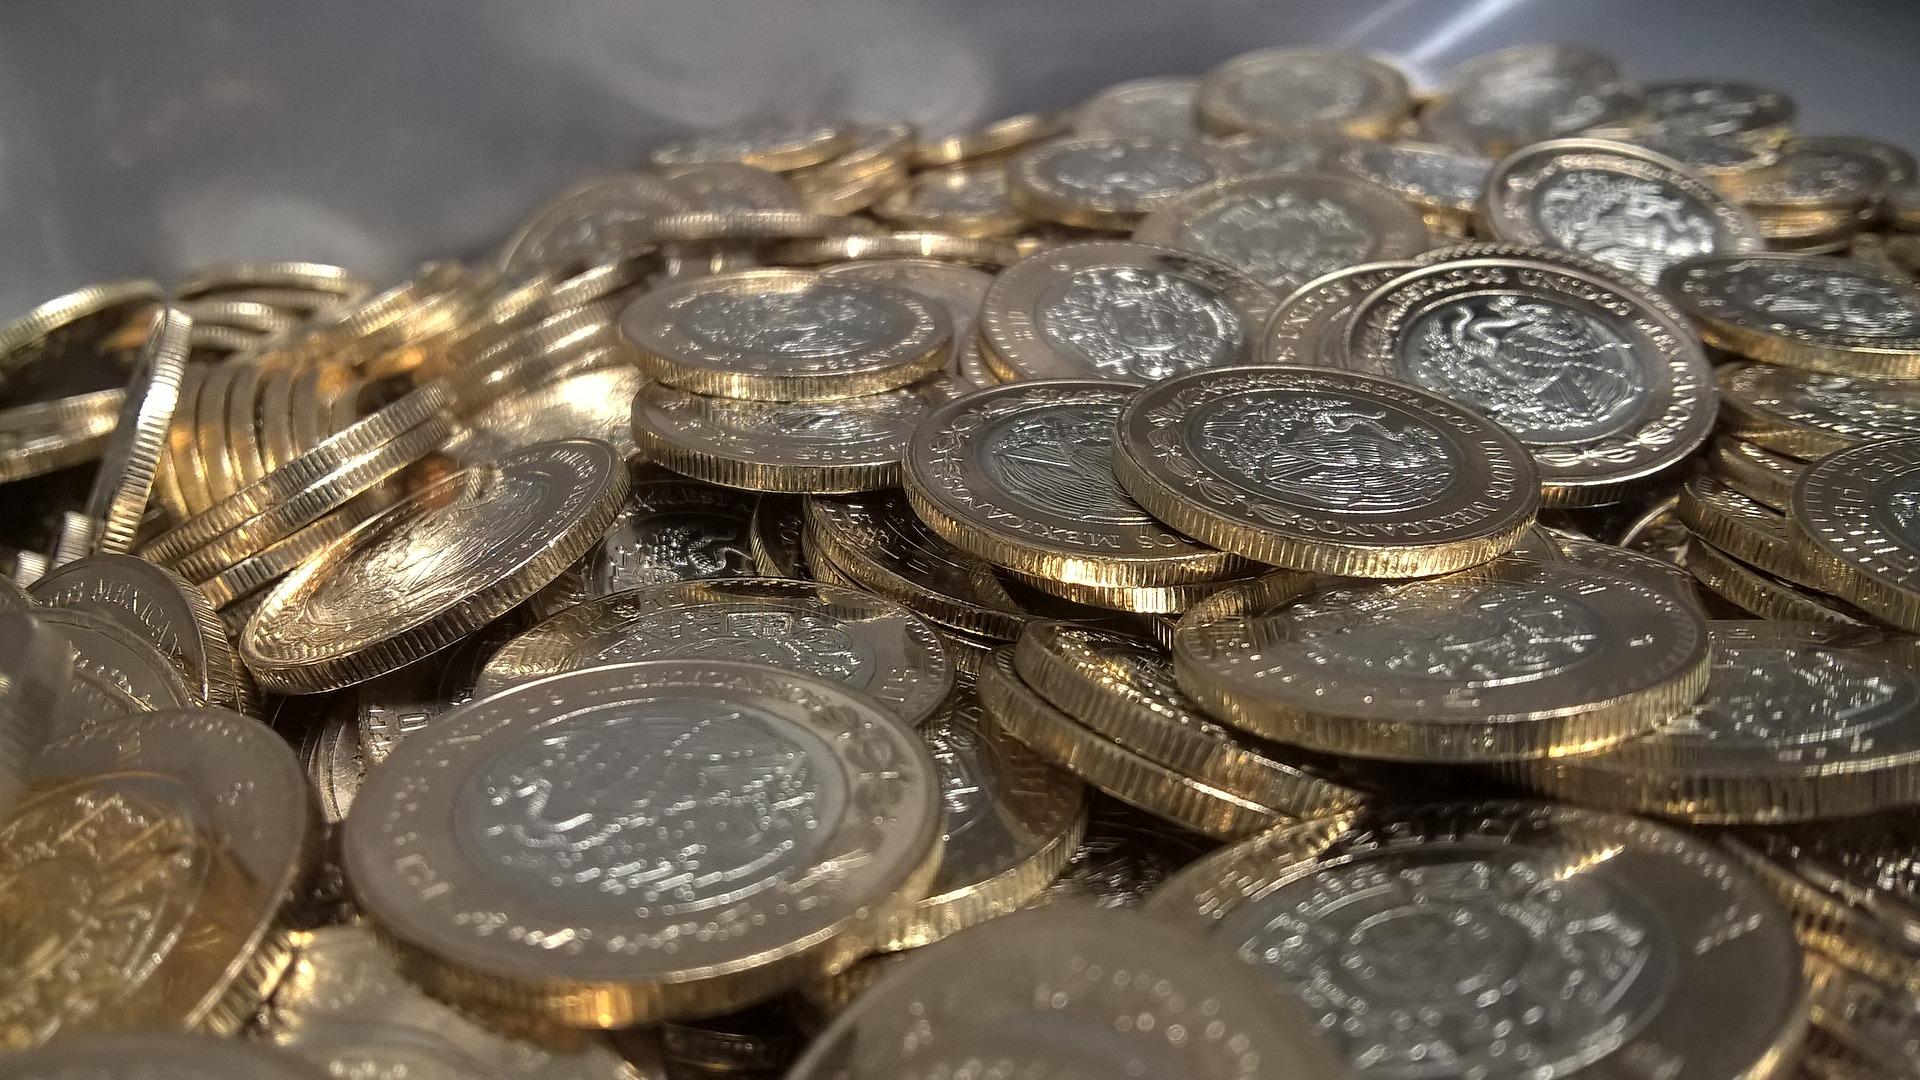 Pièces mexicaines; pesos mexicains